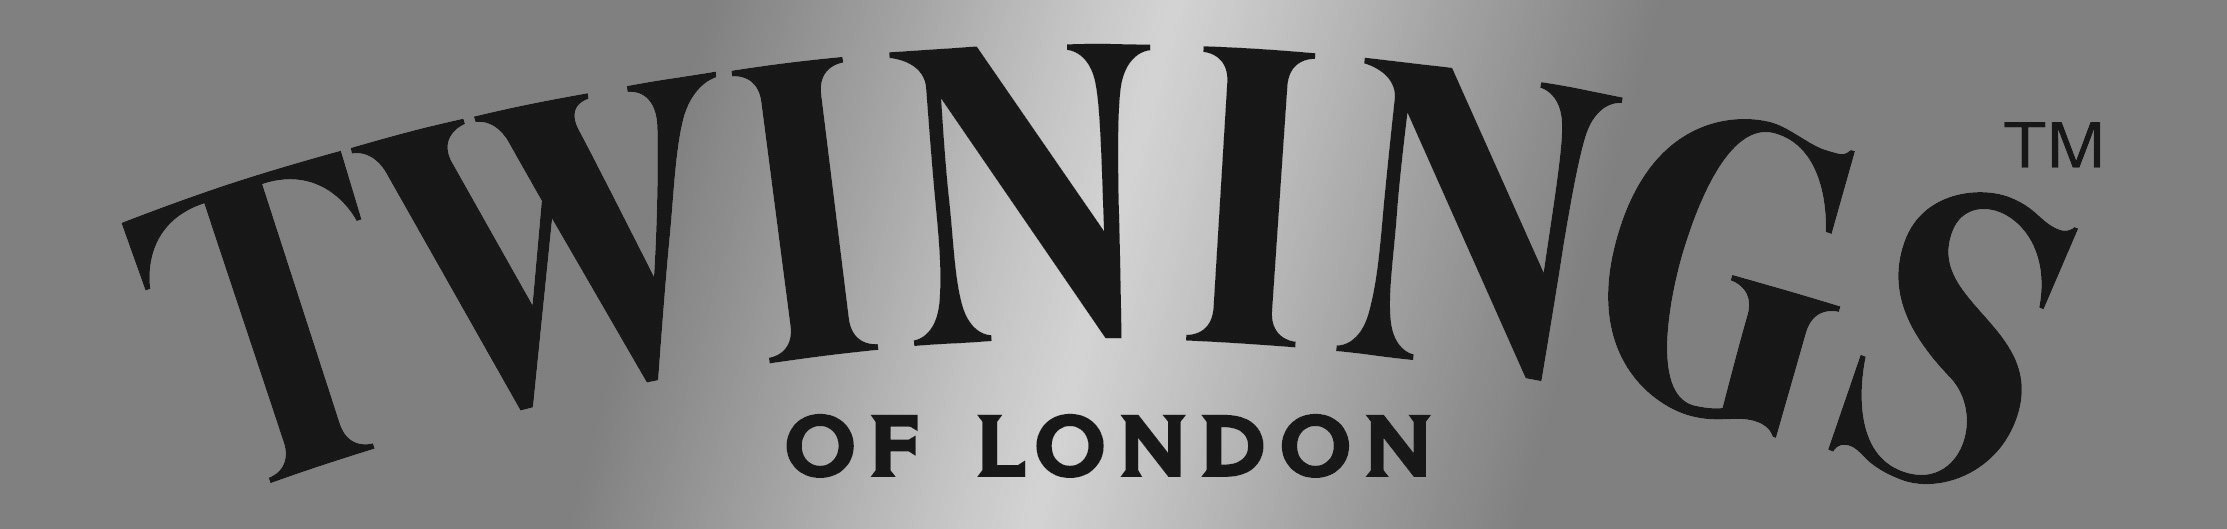 twinings_logo